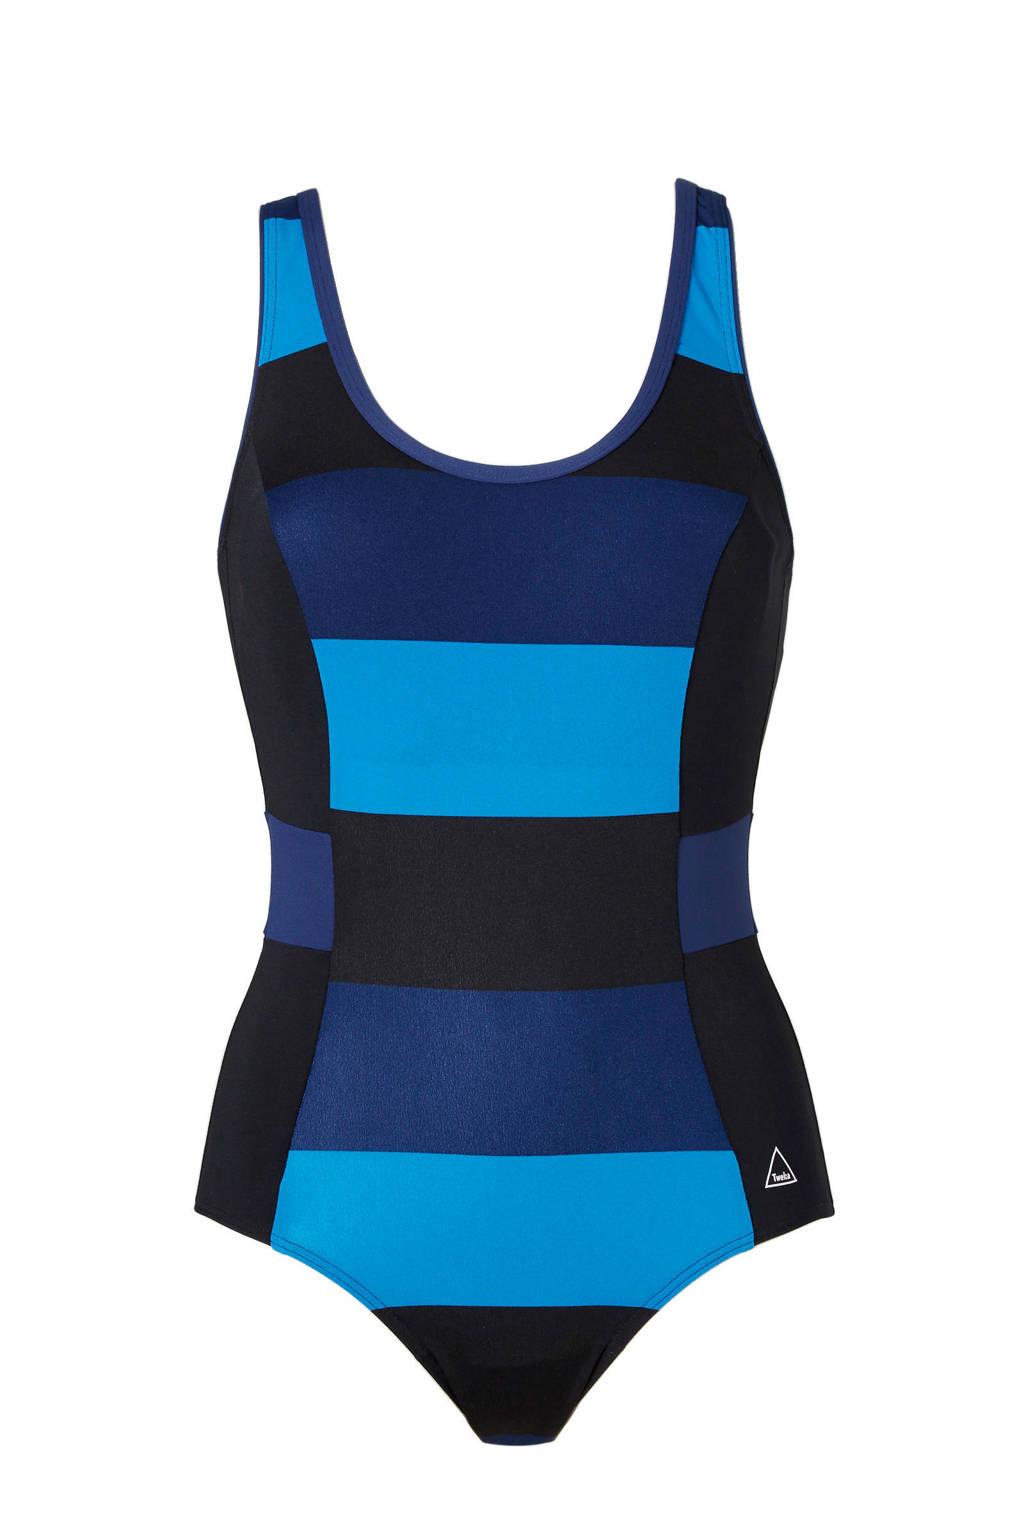 Tweka badpak met kleurvlakken zwart/blauw, Zwart/blauw